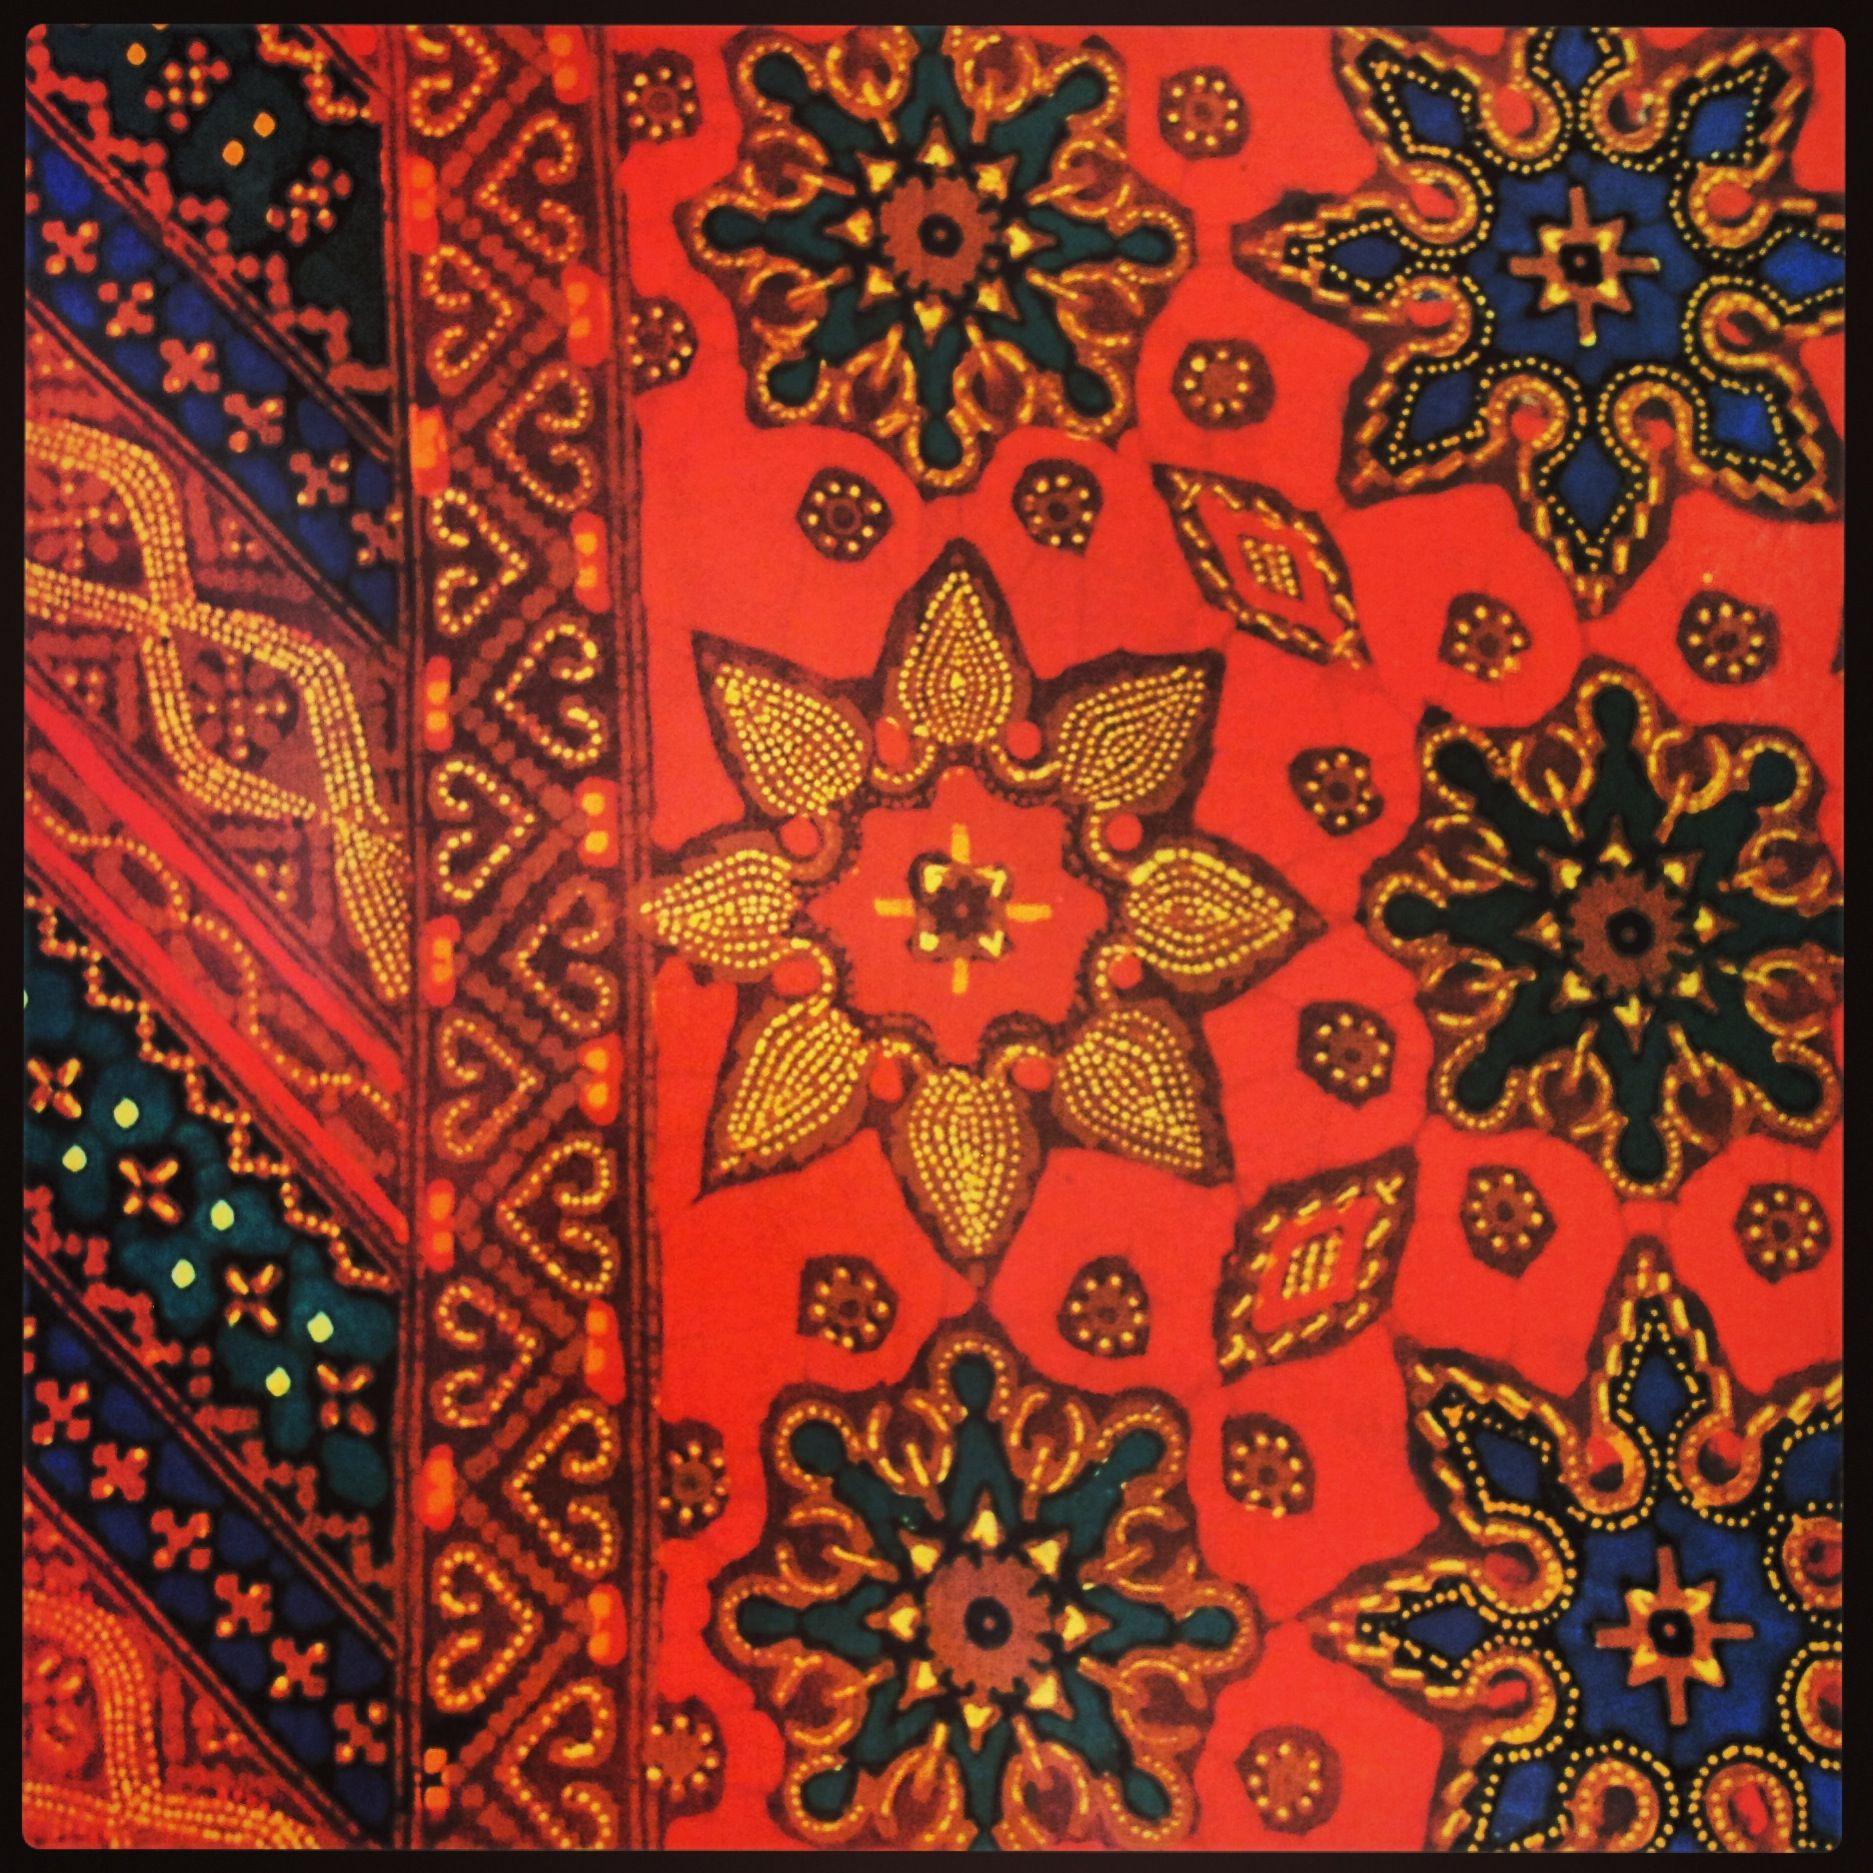 Batik From Central Java, Indonesia